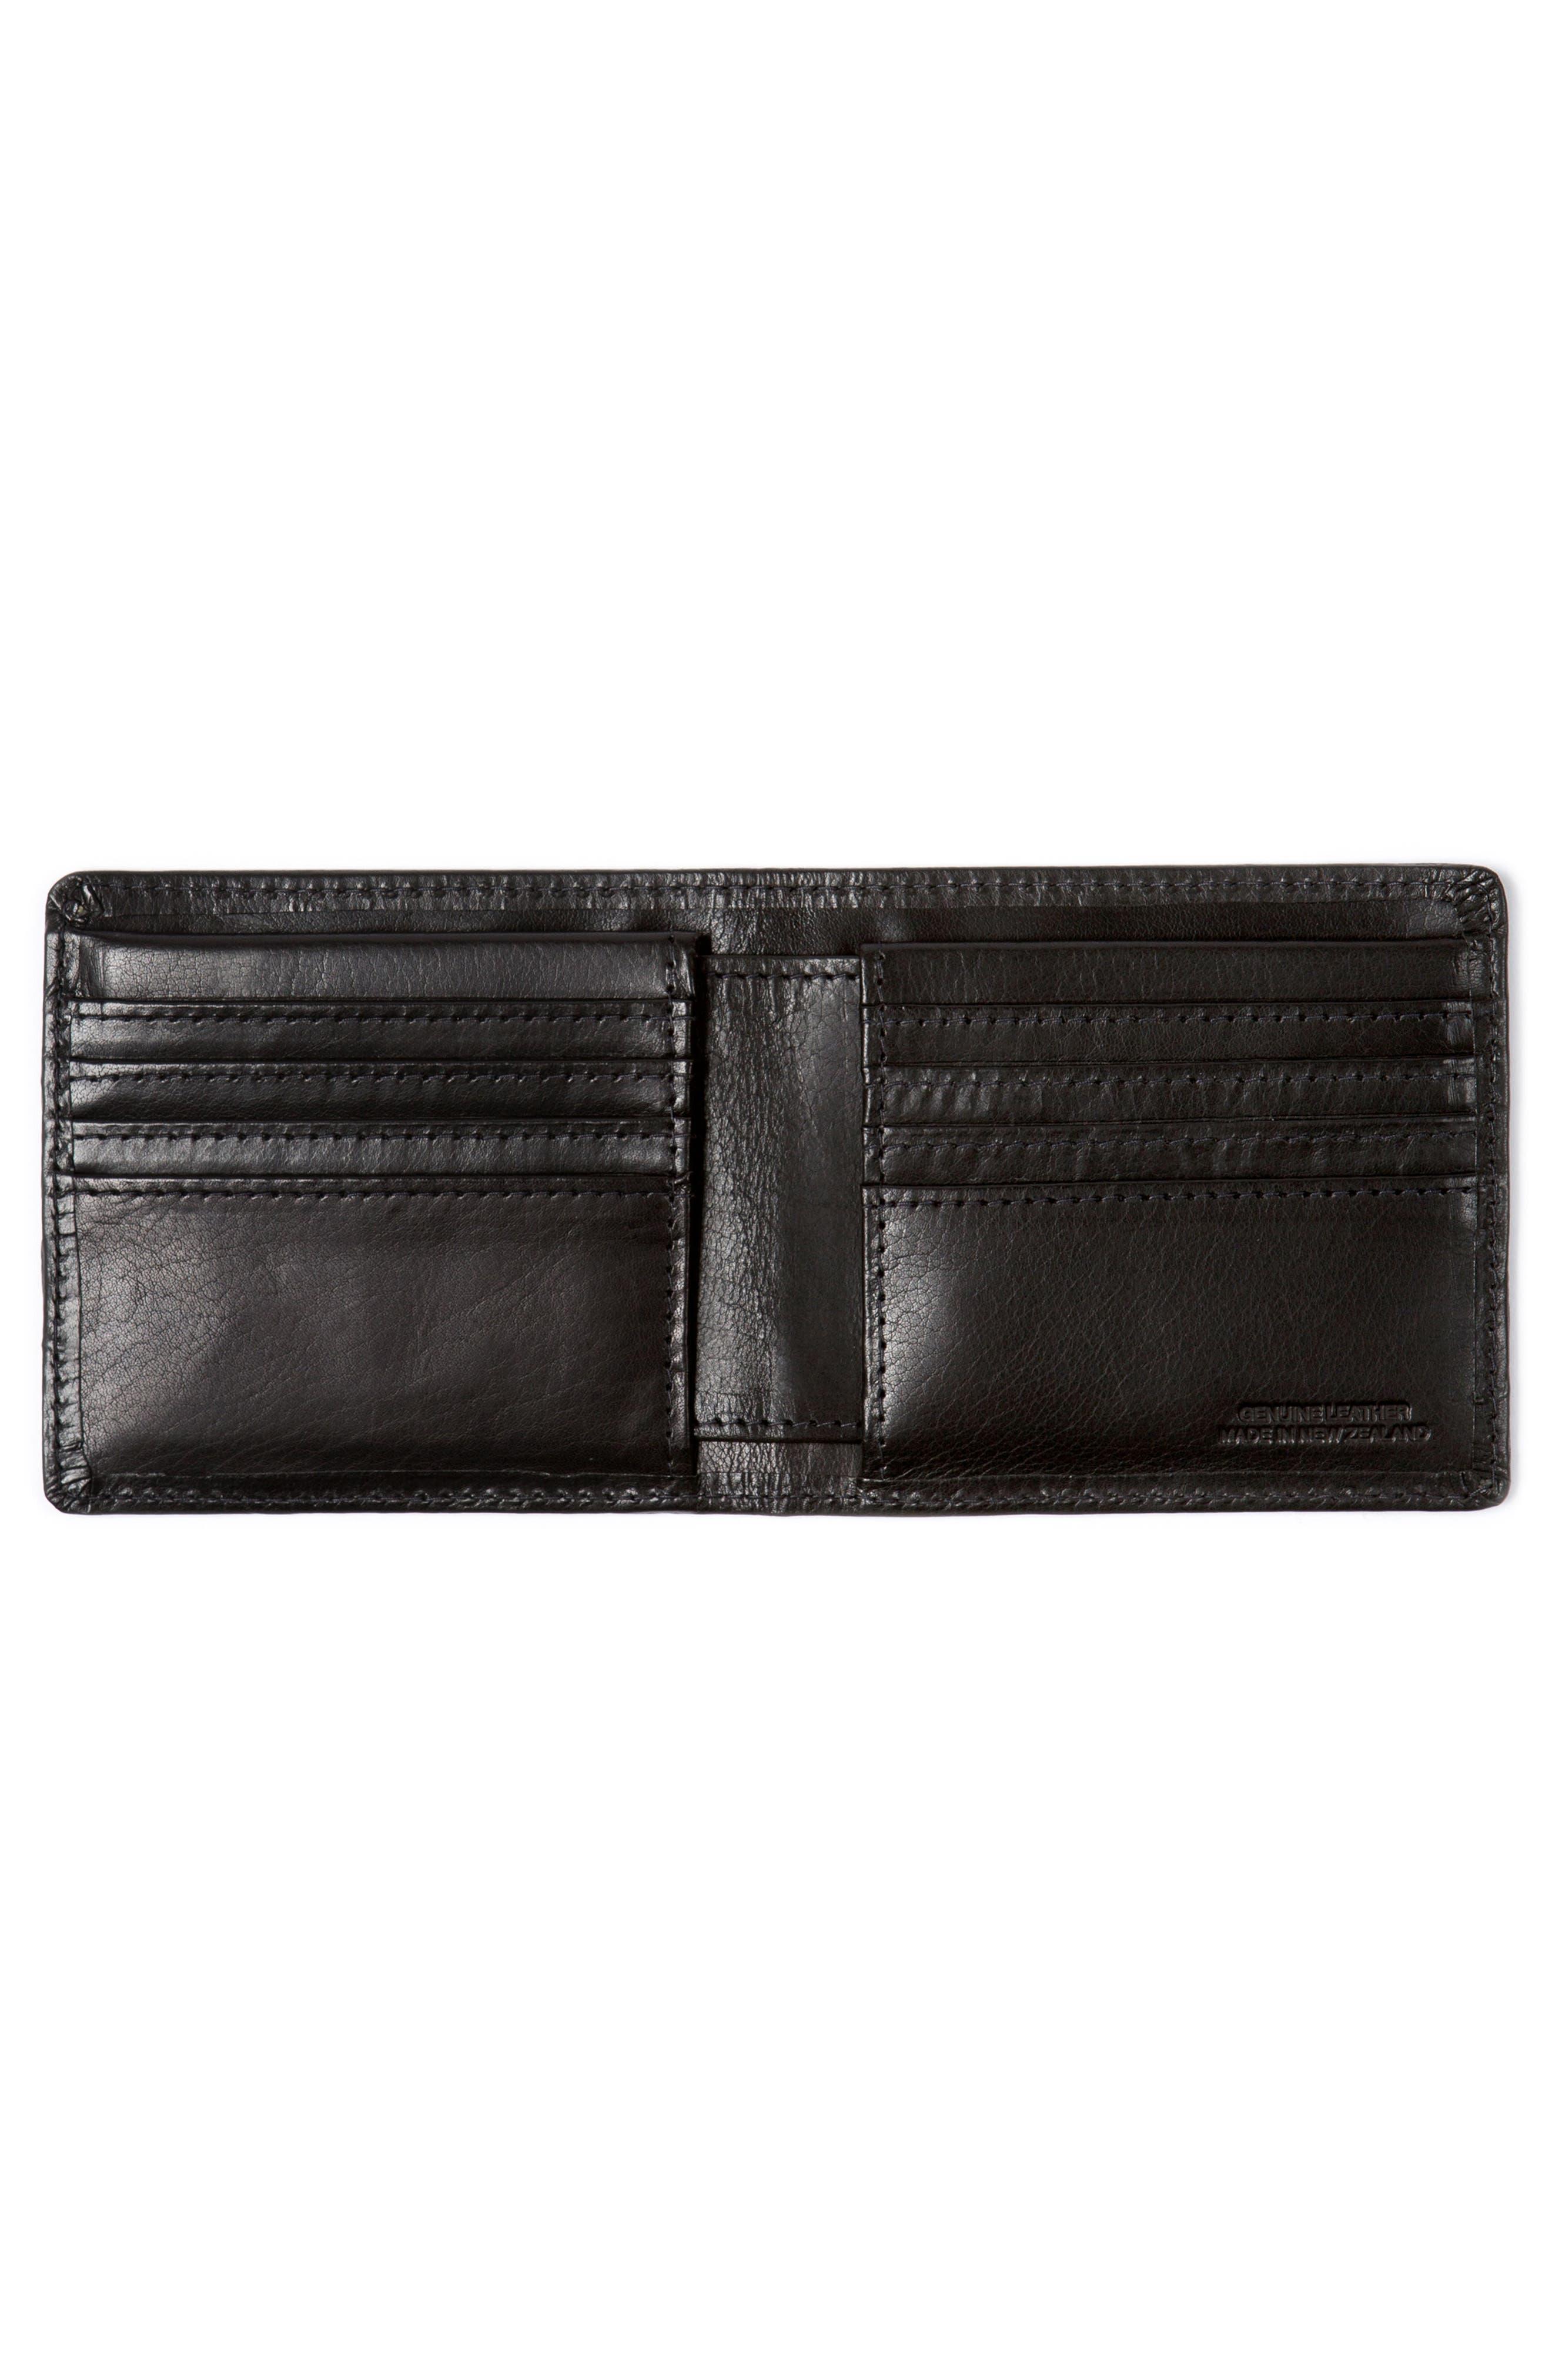 Marybank Wallet,                             Alternate thumbnail 2, color,                             001